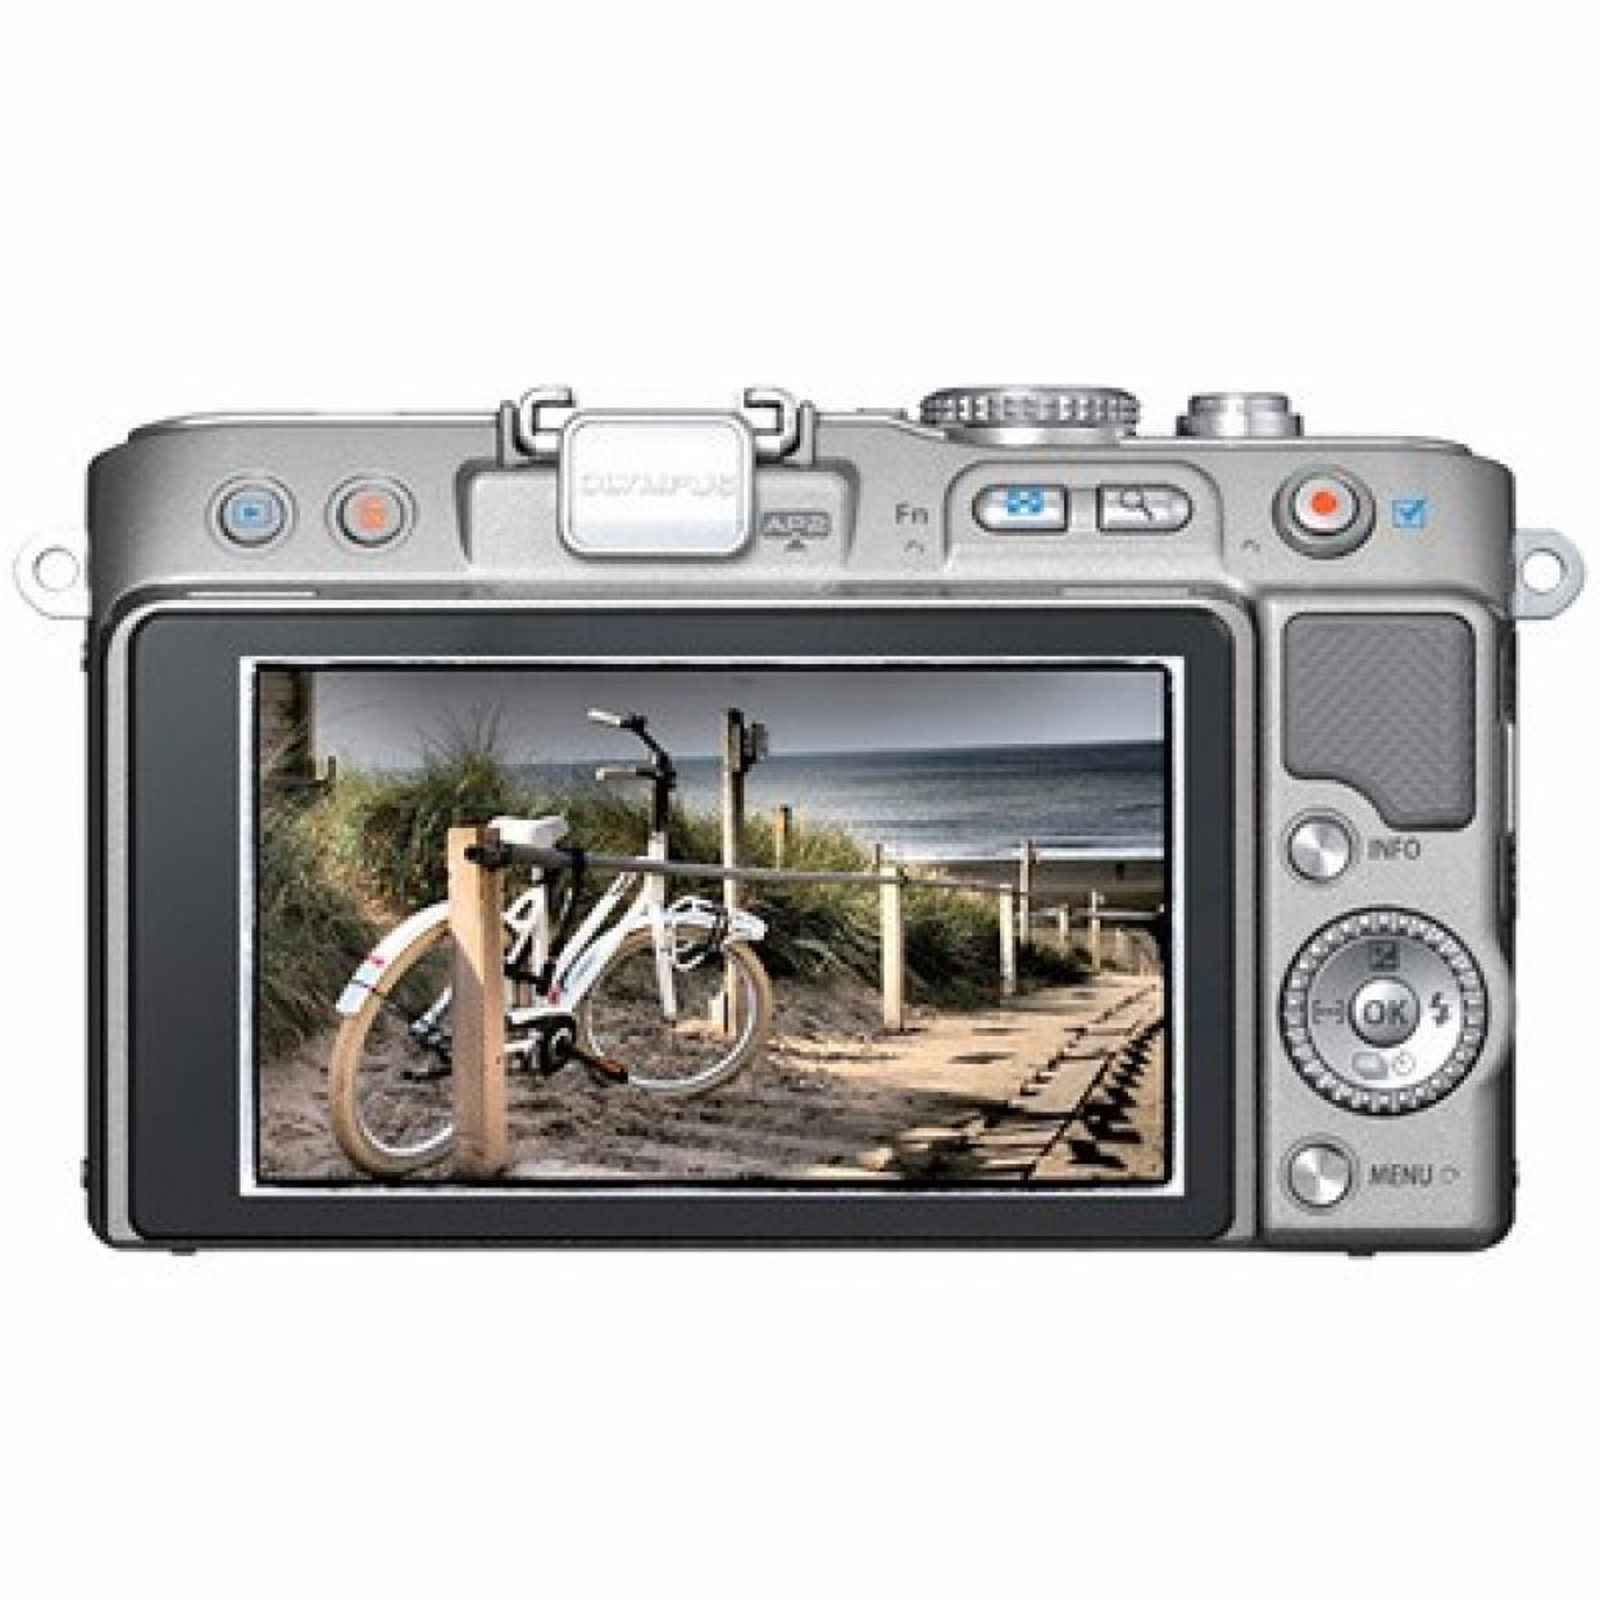 Цифровой фотоаппарат OLYMPUS PEN E-PL3 12-50 mm kit silver/silver (V20503FSE000) изображение 2